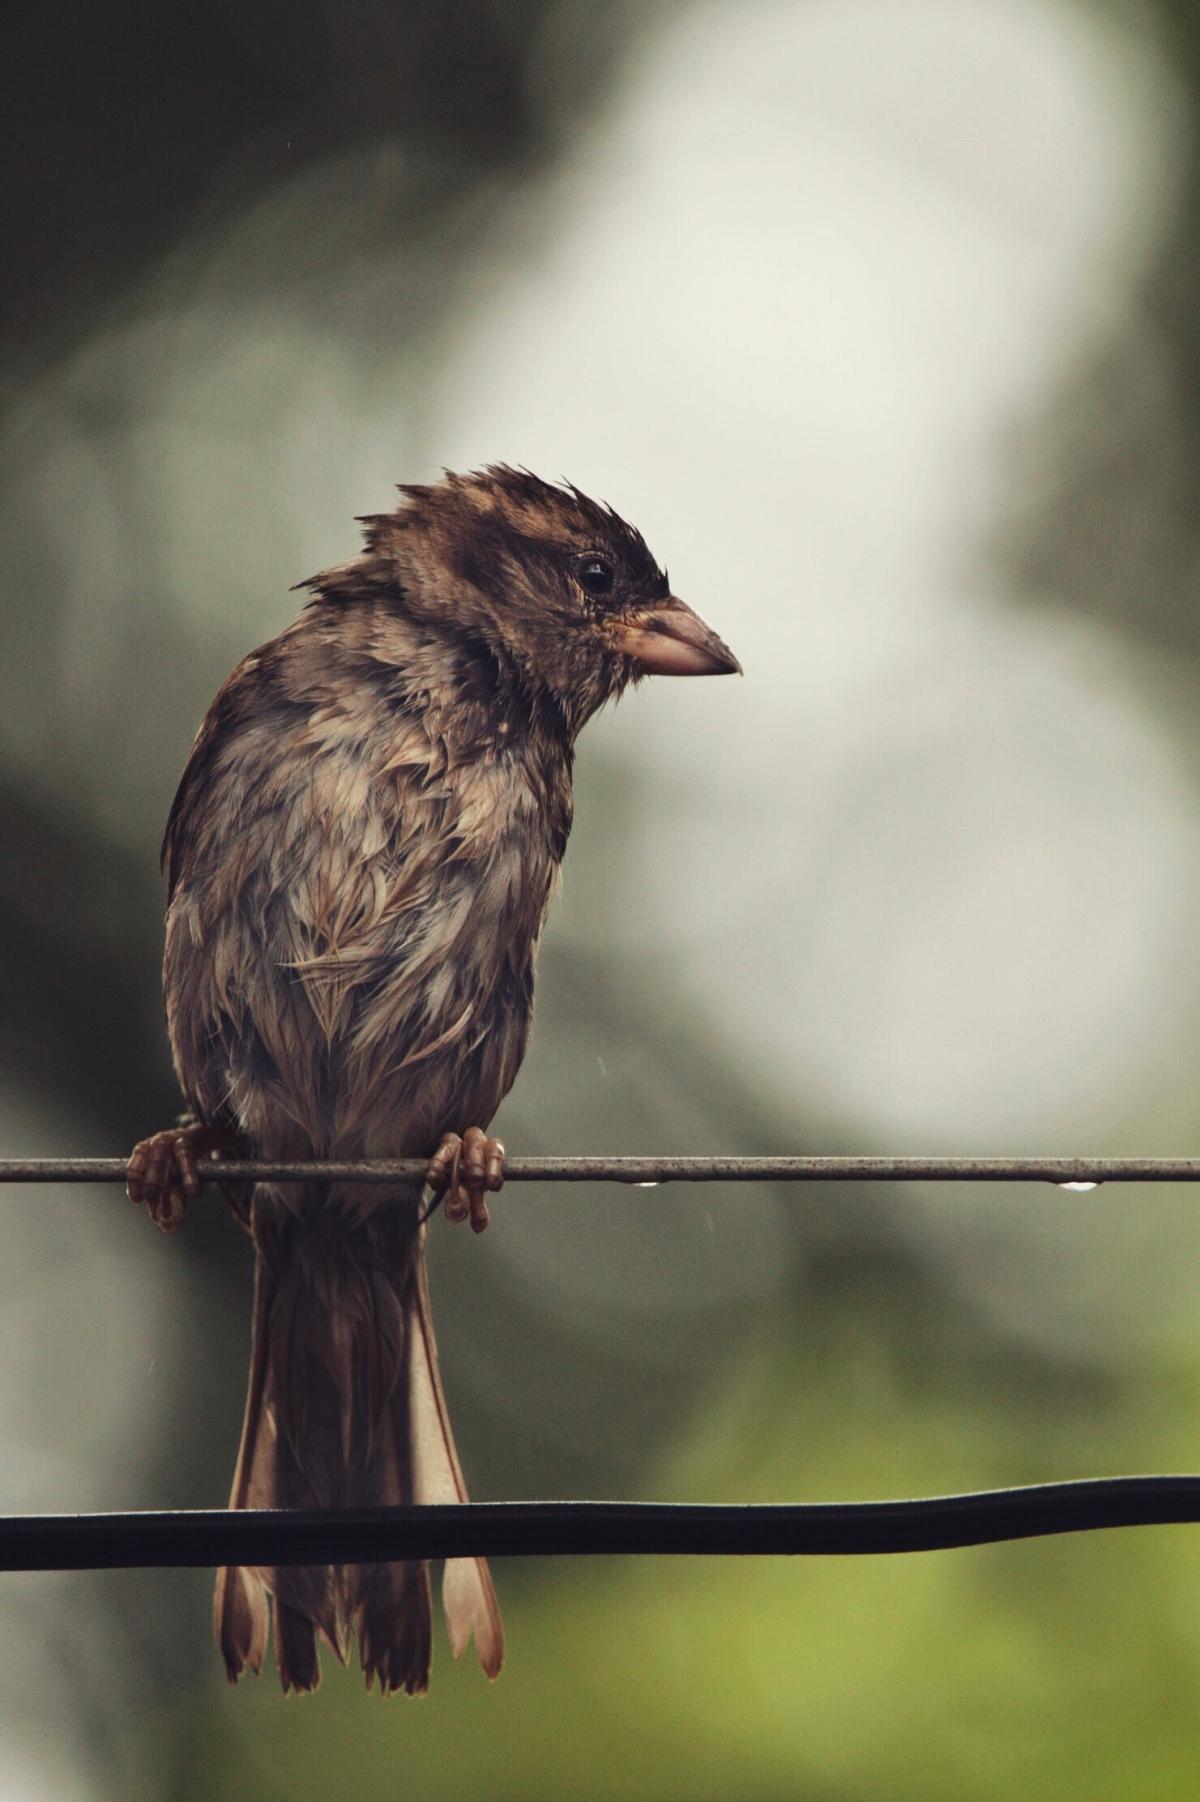 Sparrow in the rain – McAllen,TX